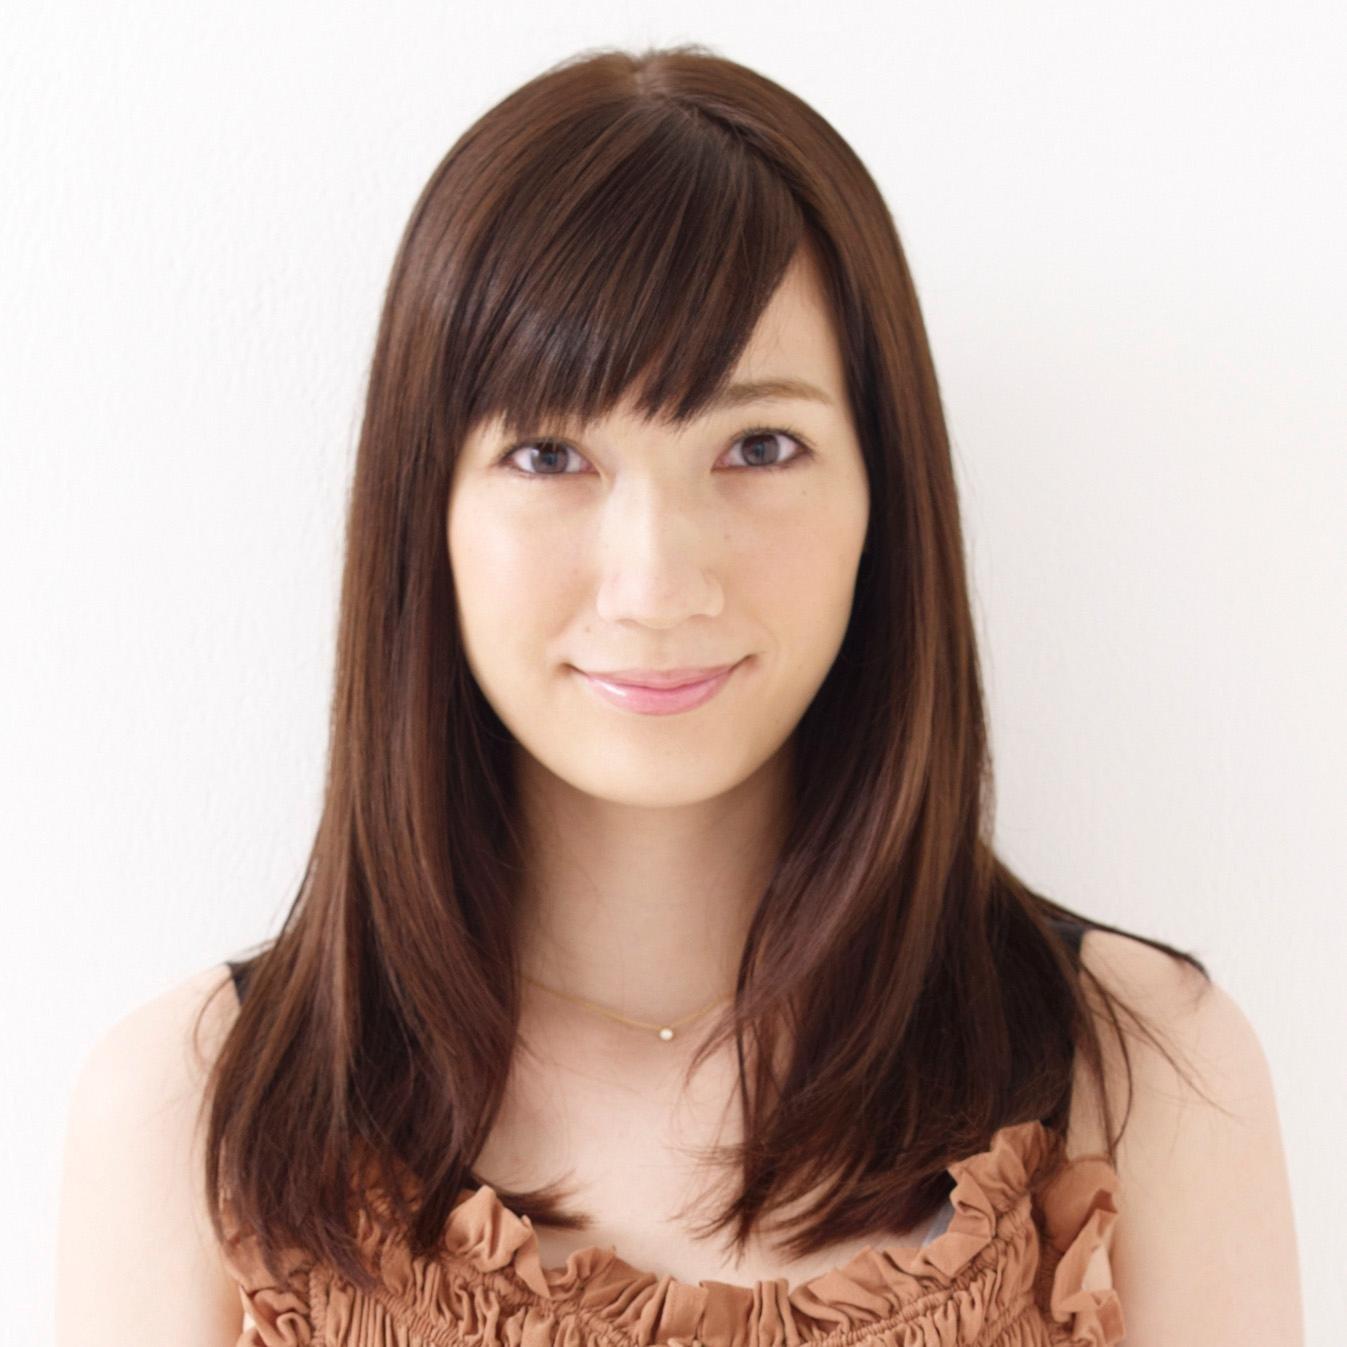 tsumabukisatoshi married myco o134713471253958205885 - 妻夫木聡が遂に結婚!相手の女優・マイコってどんな人?